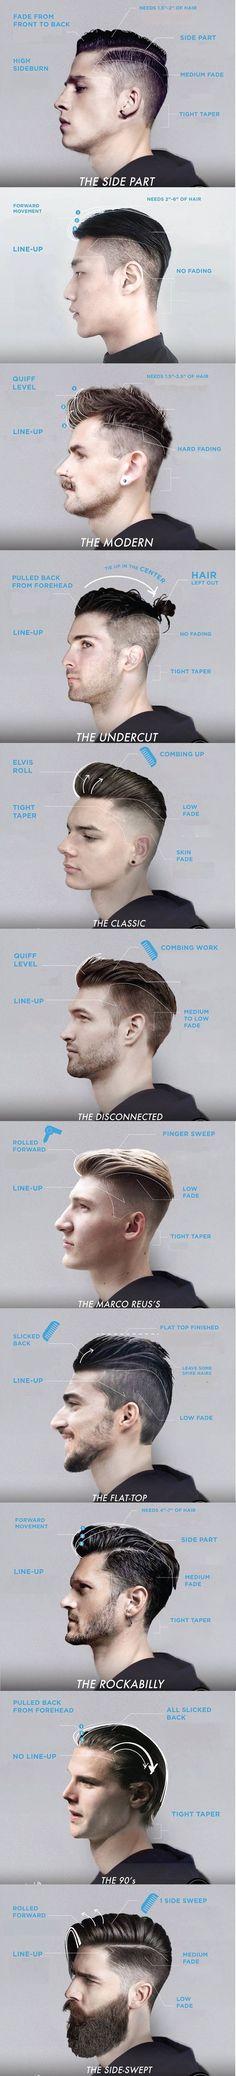 Pleasant Face Shapes Men Hair And Men39S Hairstyle On Pinterest Short Hairstyles For Black Women Fulllsitofus